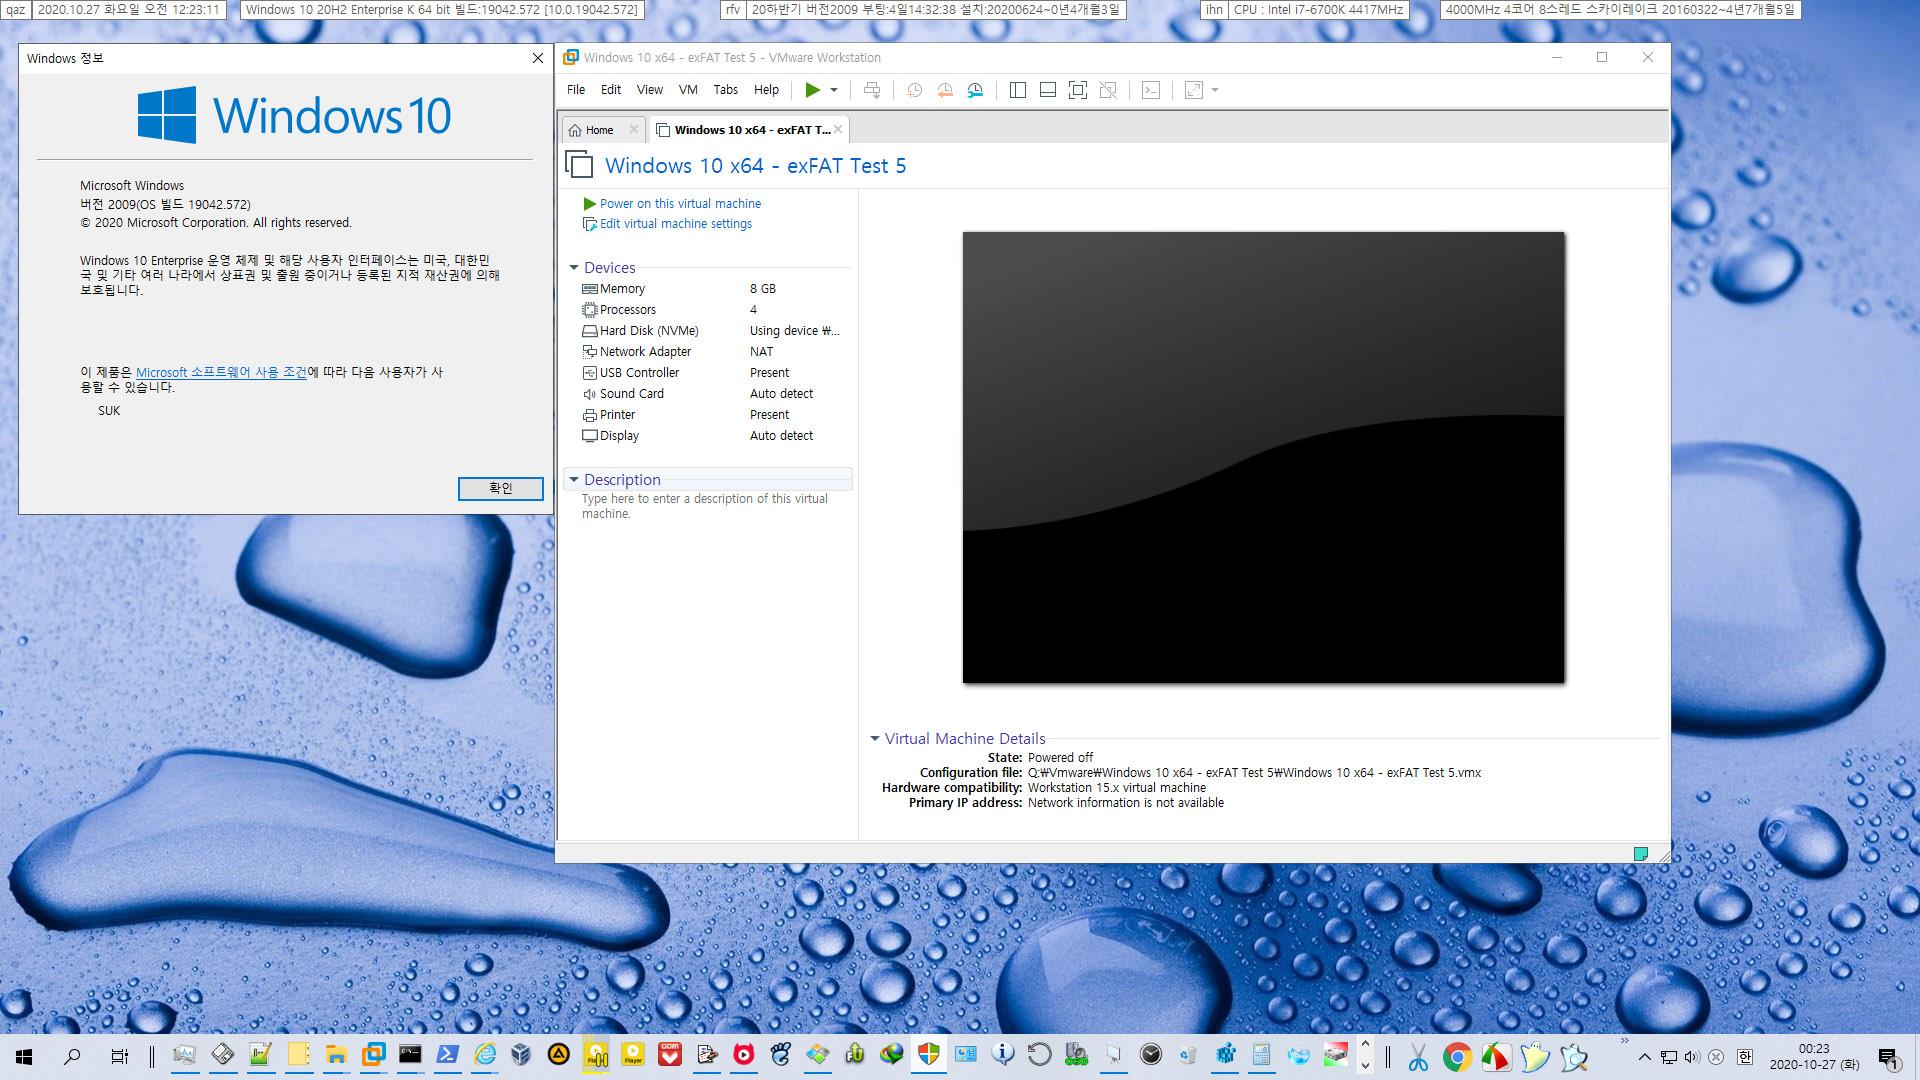 exFAT 포맷으로도 VHD 부팅이 Windows 10 버전 1903부터 된다고 하여 테스트 - 생고생만 하다가 컴퓨터 먹통 2번이나 되고 그만뒀습니다 2020-10-27_002311.jpg